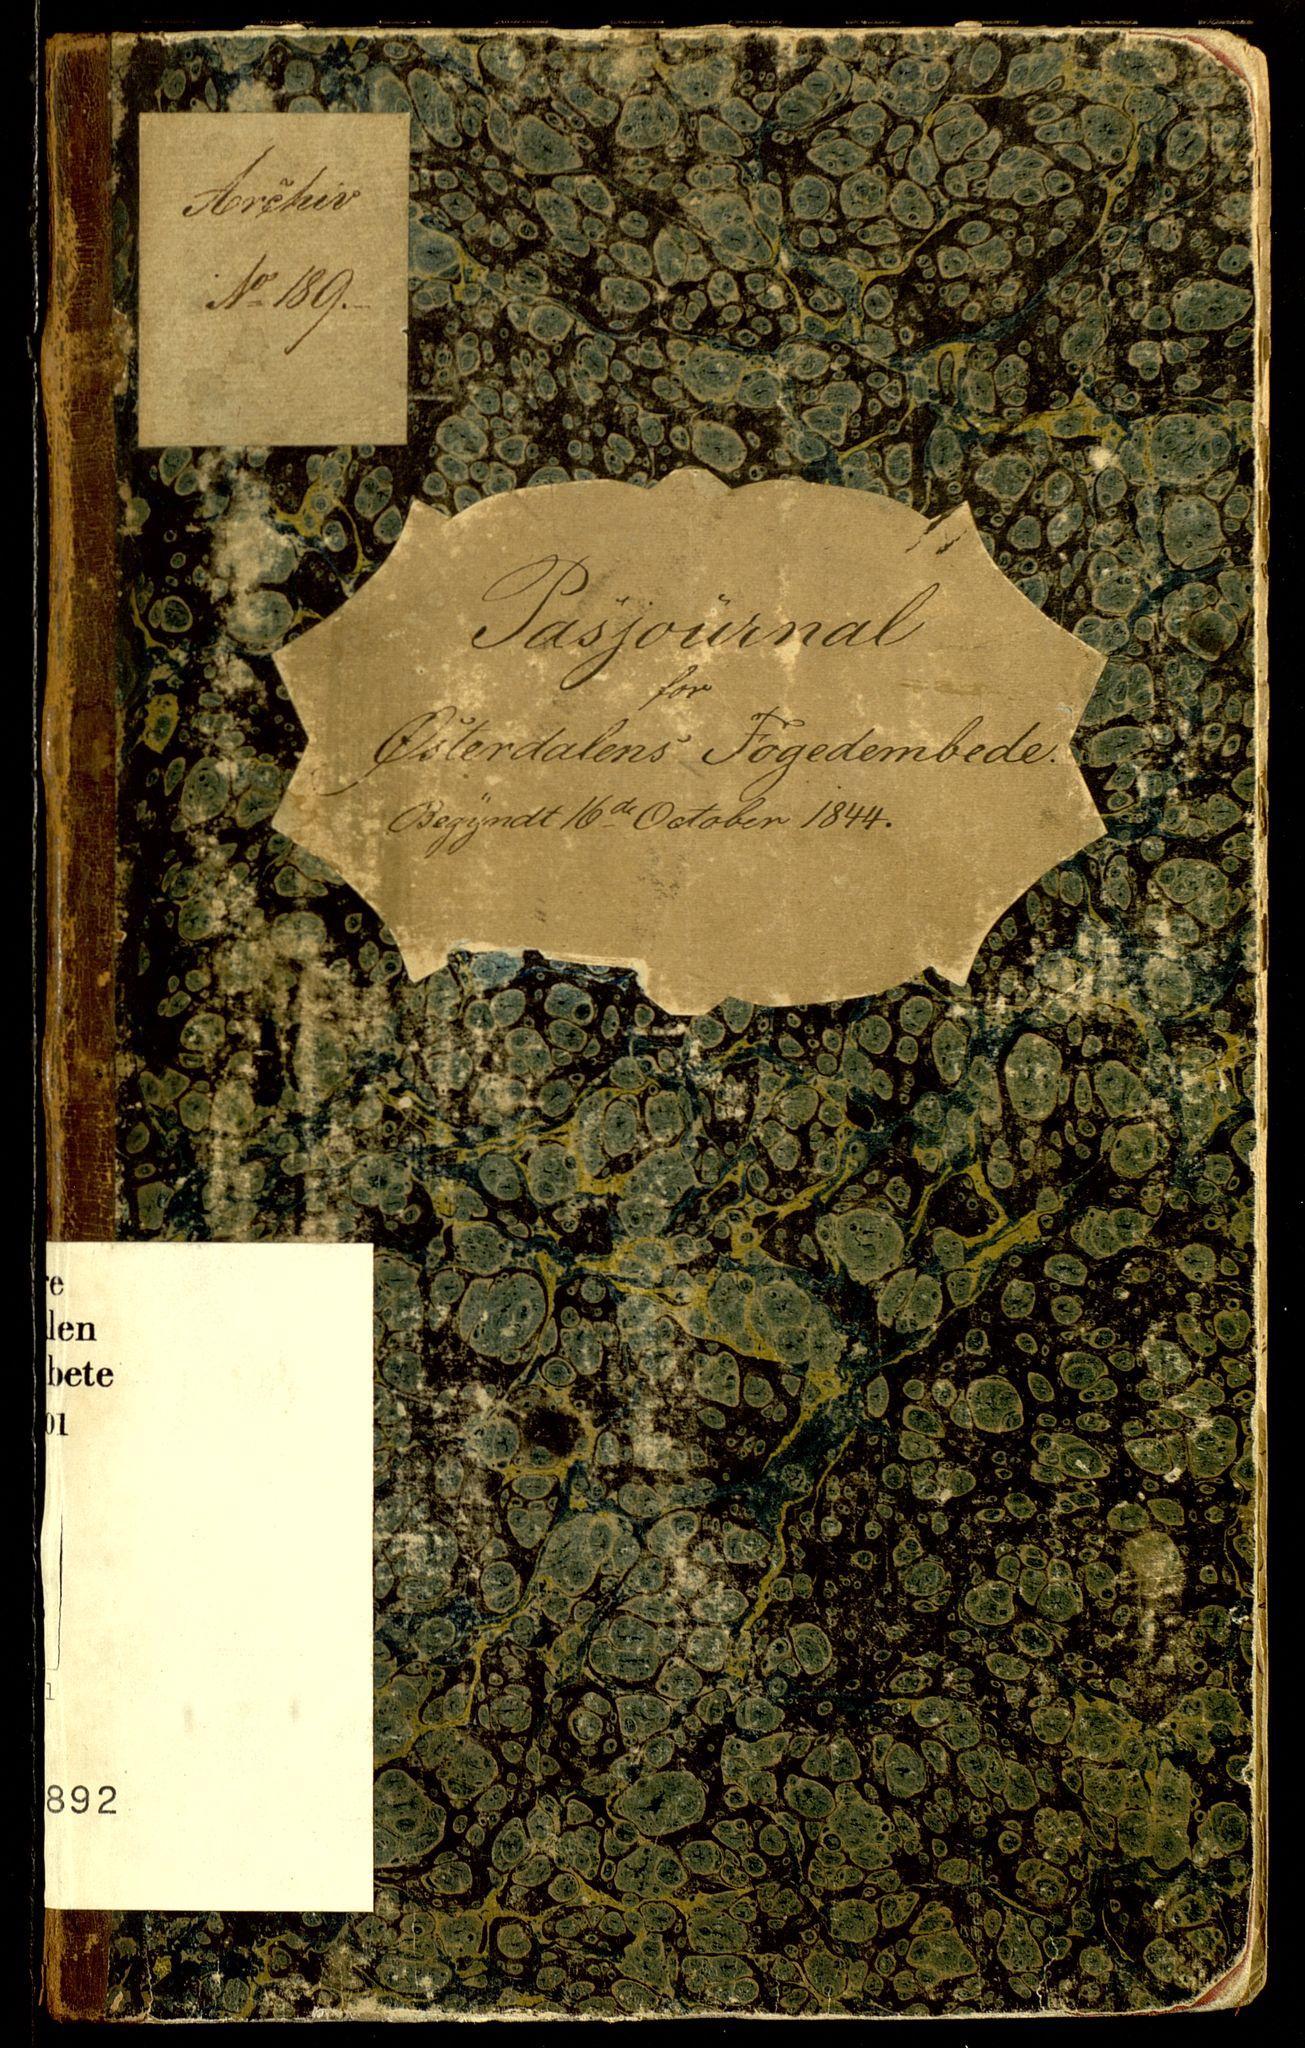 SAH, Søndre Østerdalen fogderi, L/La/L0001: Passjournal, 1844-1900